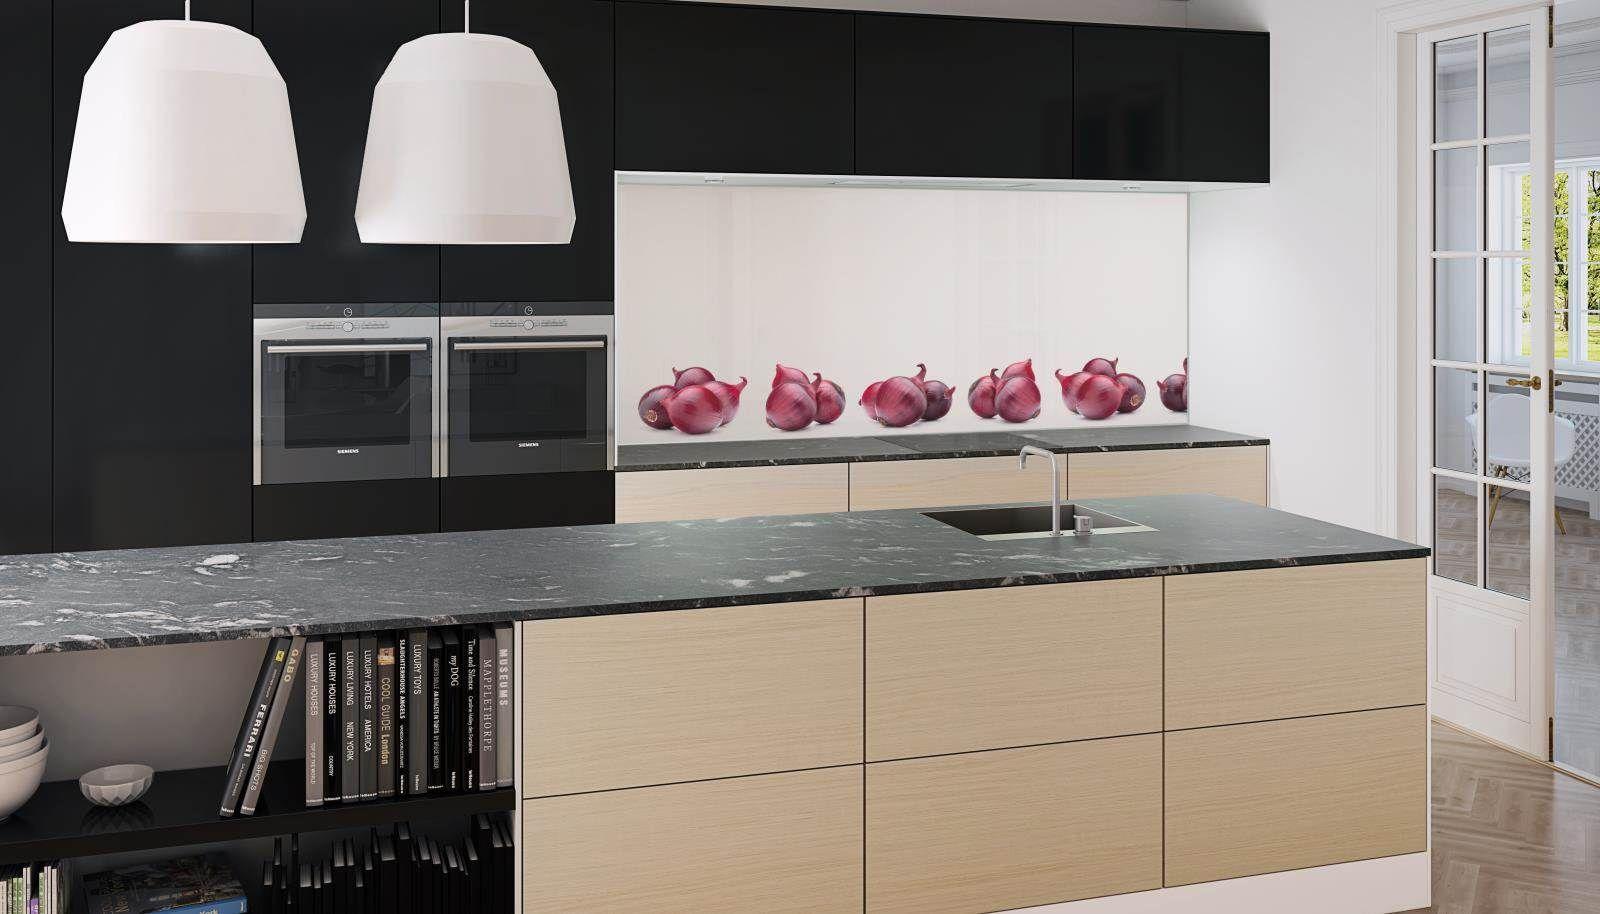 lechner k chenarbeitsplatten design black cosmic k chenarbeitsplatten aus naturstein von. Black Bedroom Furniture Sets. Home Design Ideas